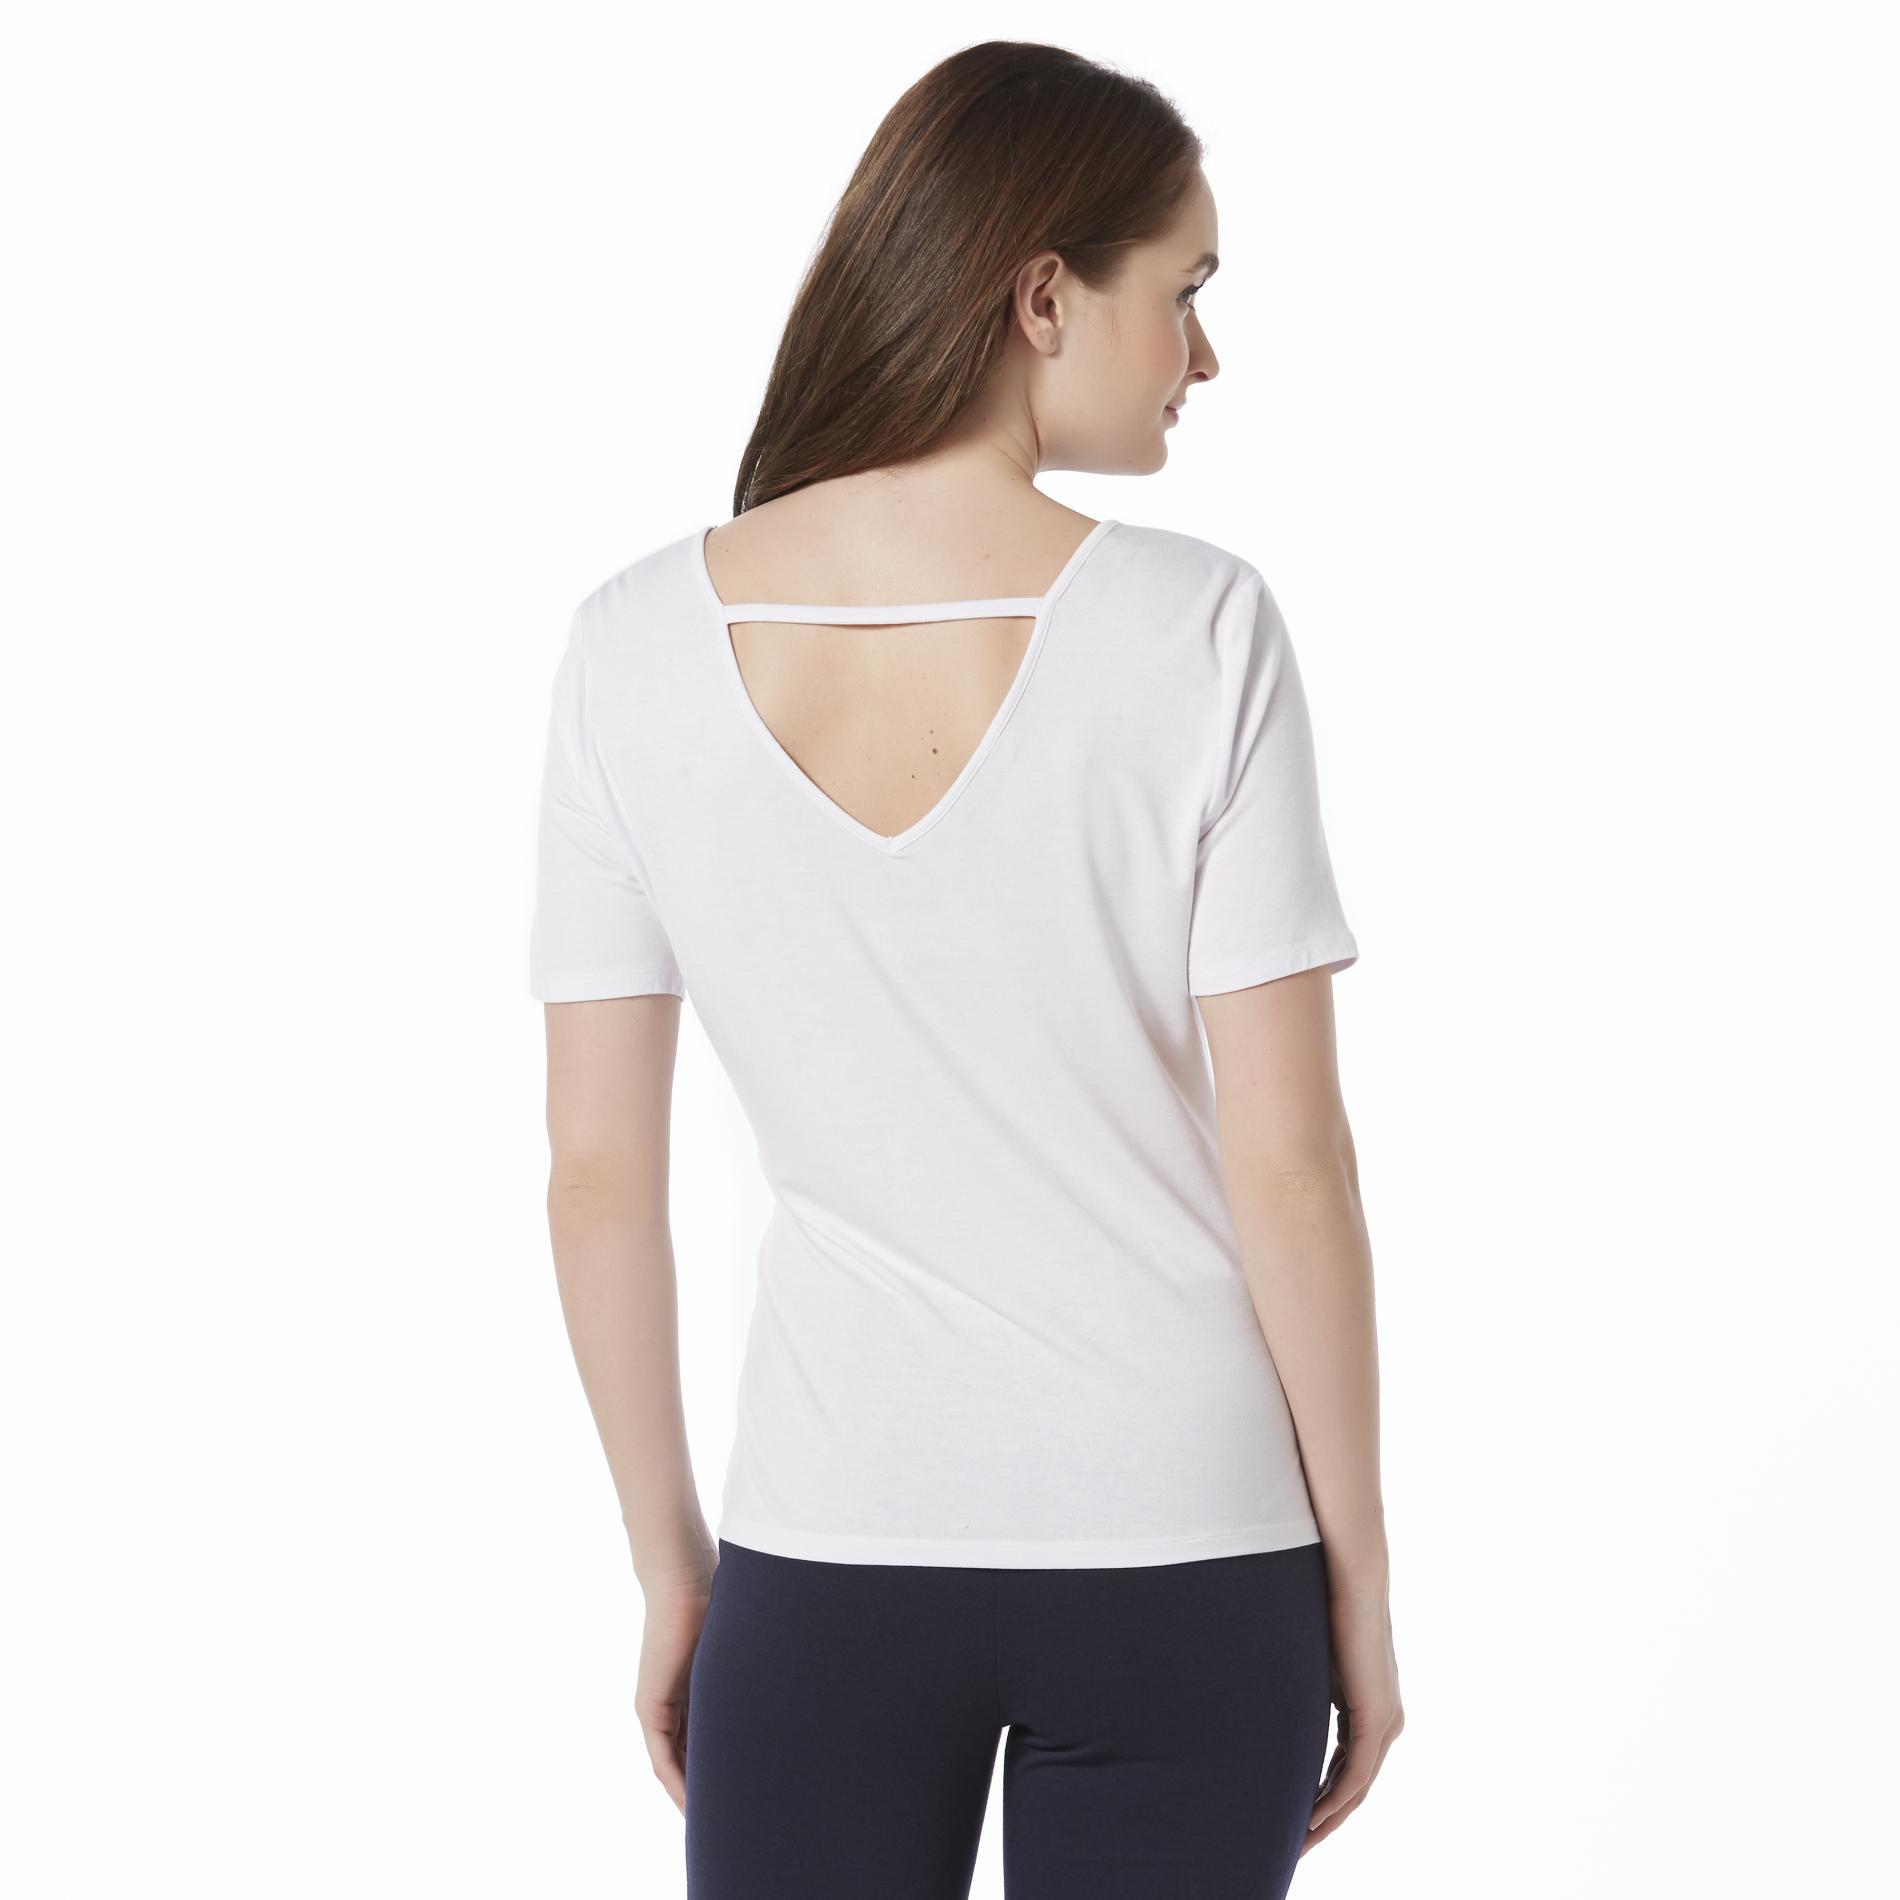 Metaphor Womens Double V Neck T Shirt